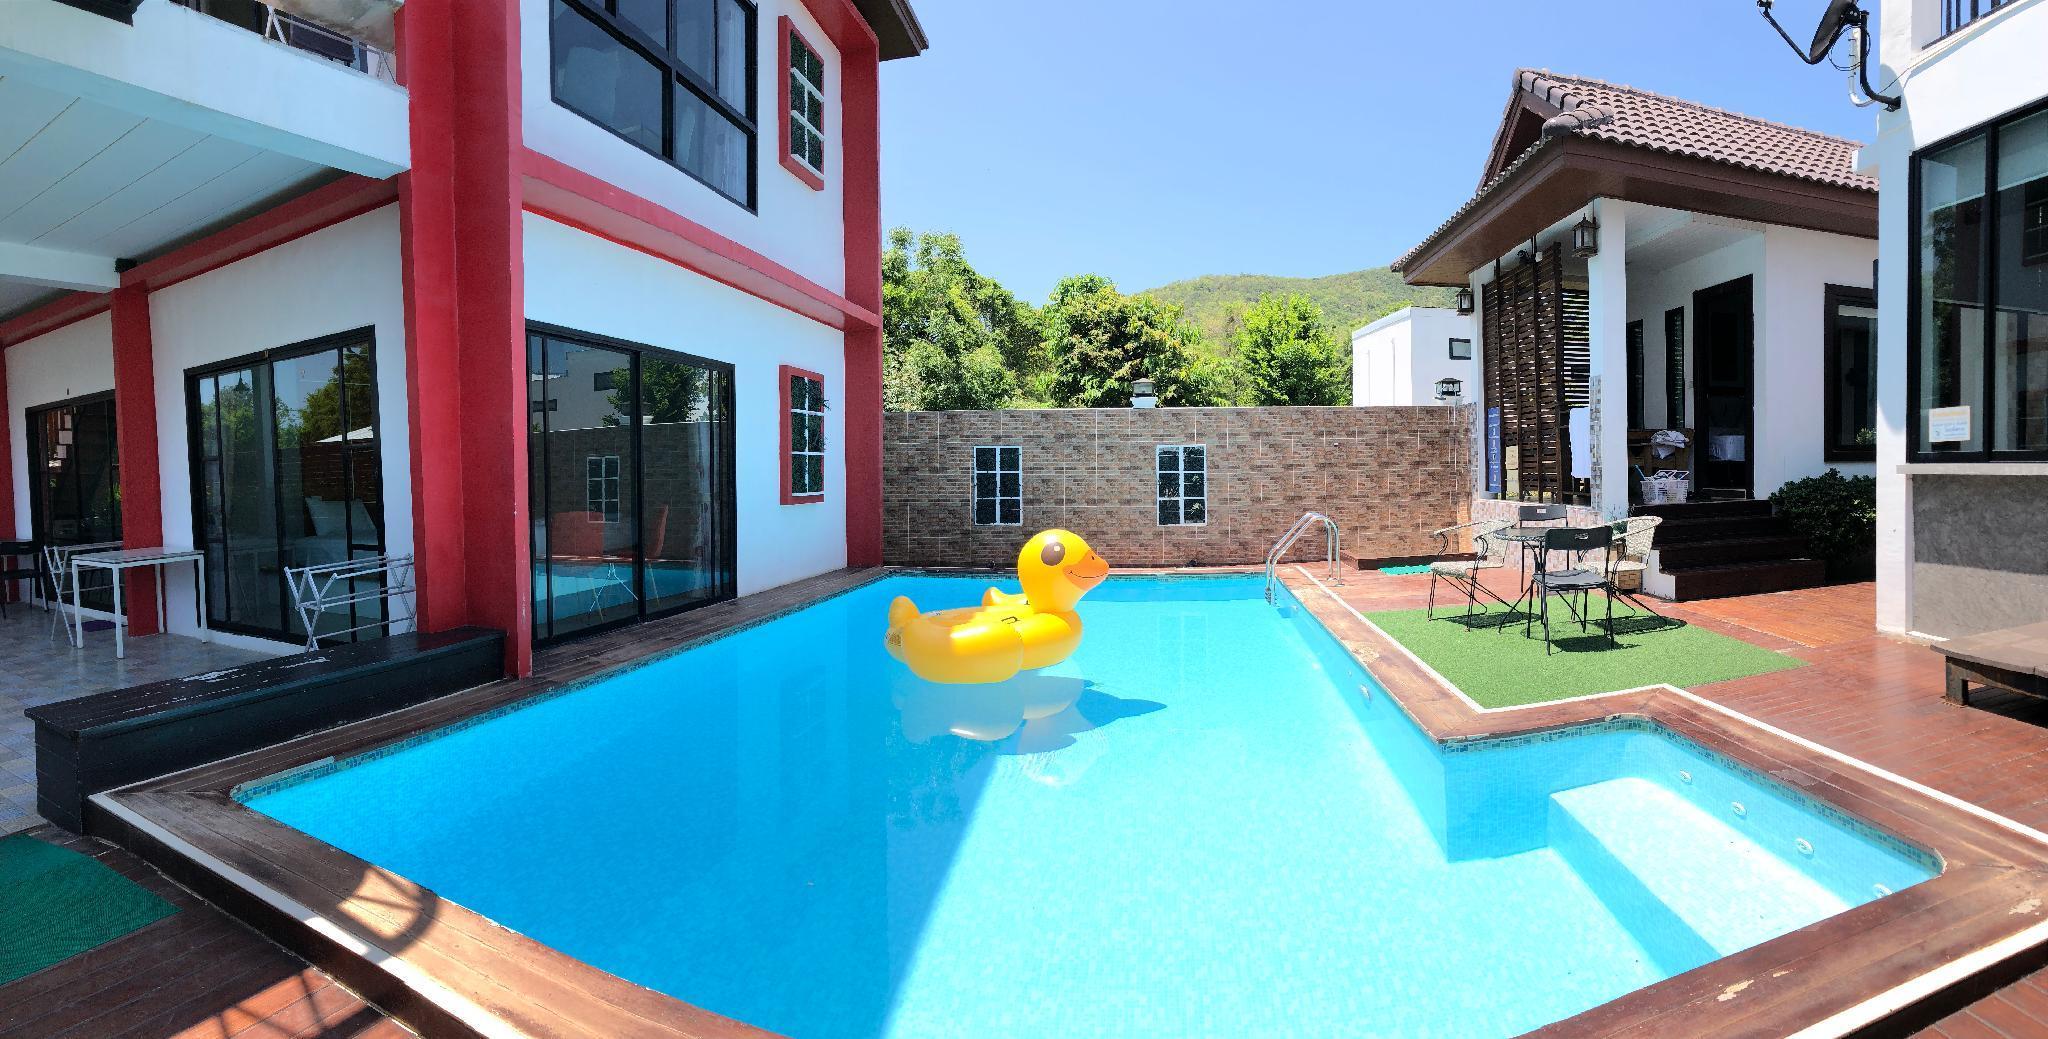 Virawan Pool Villa